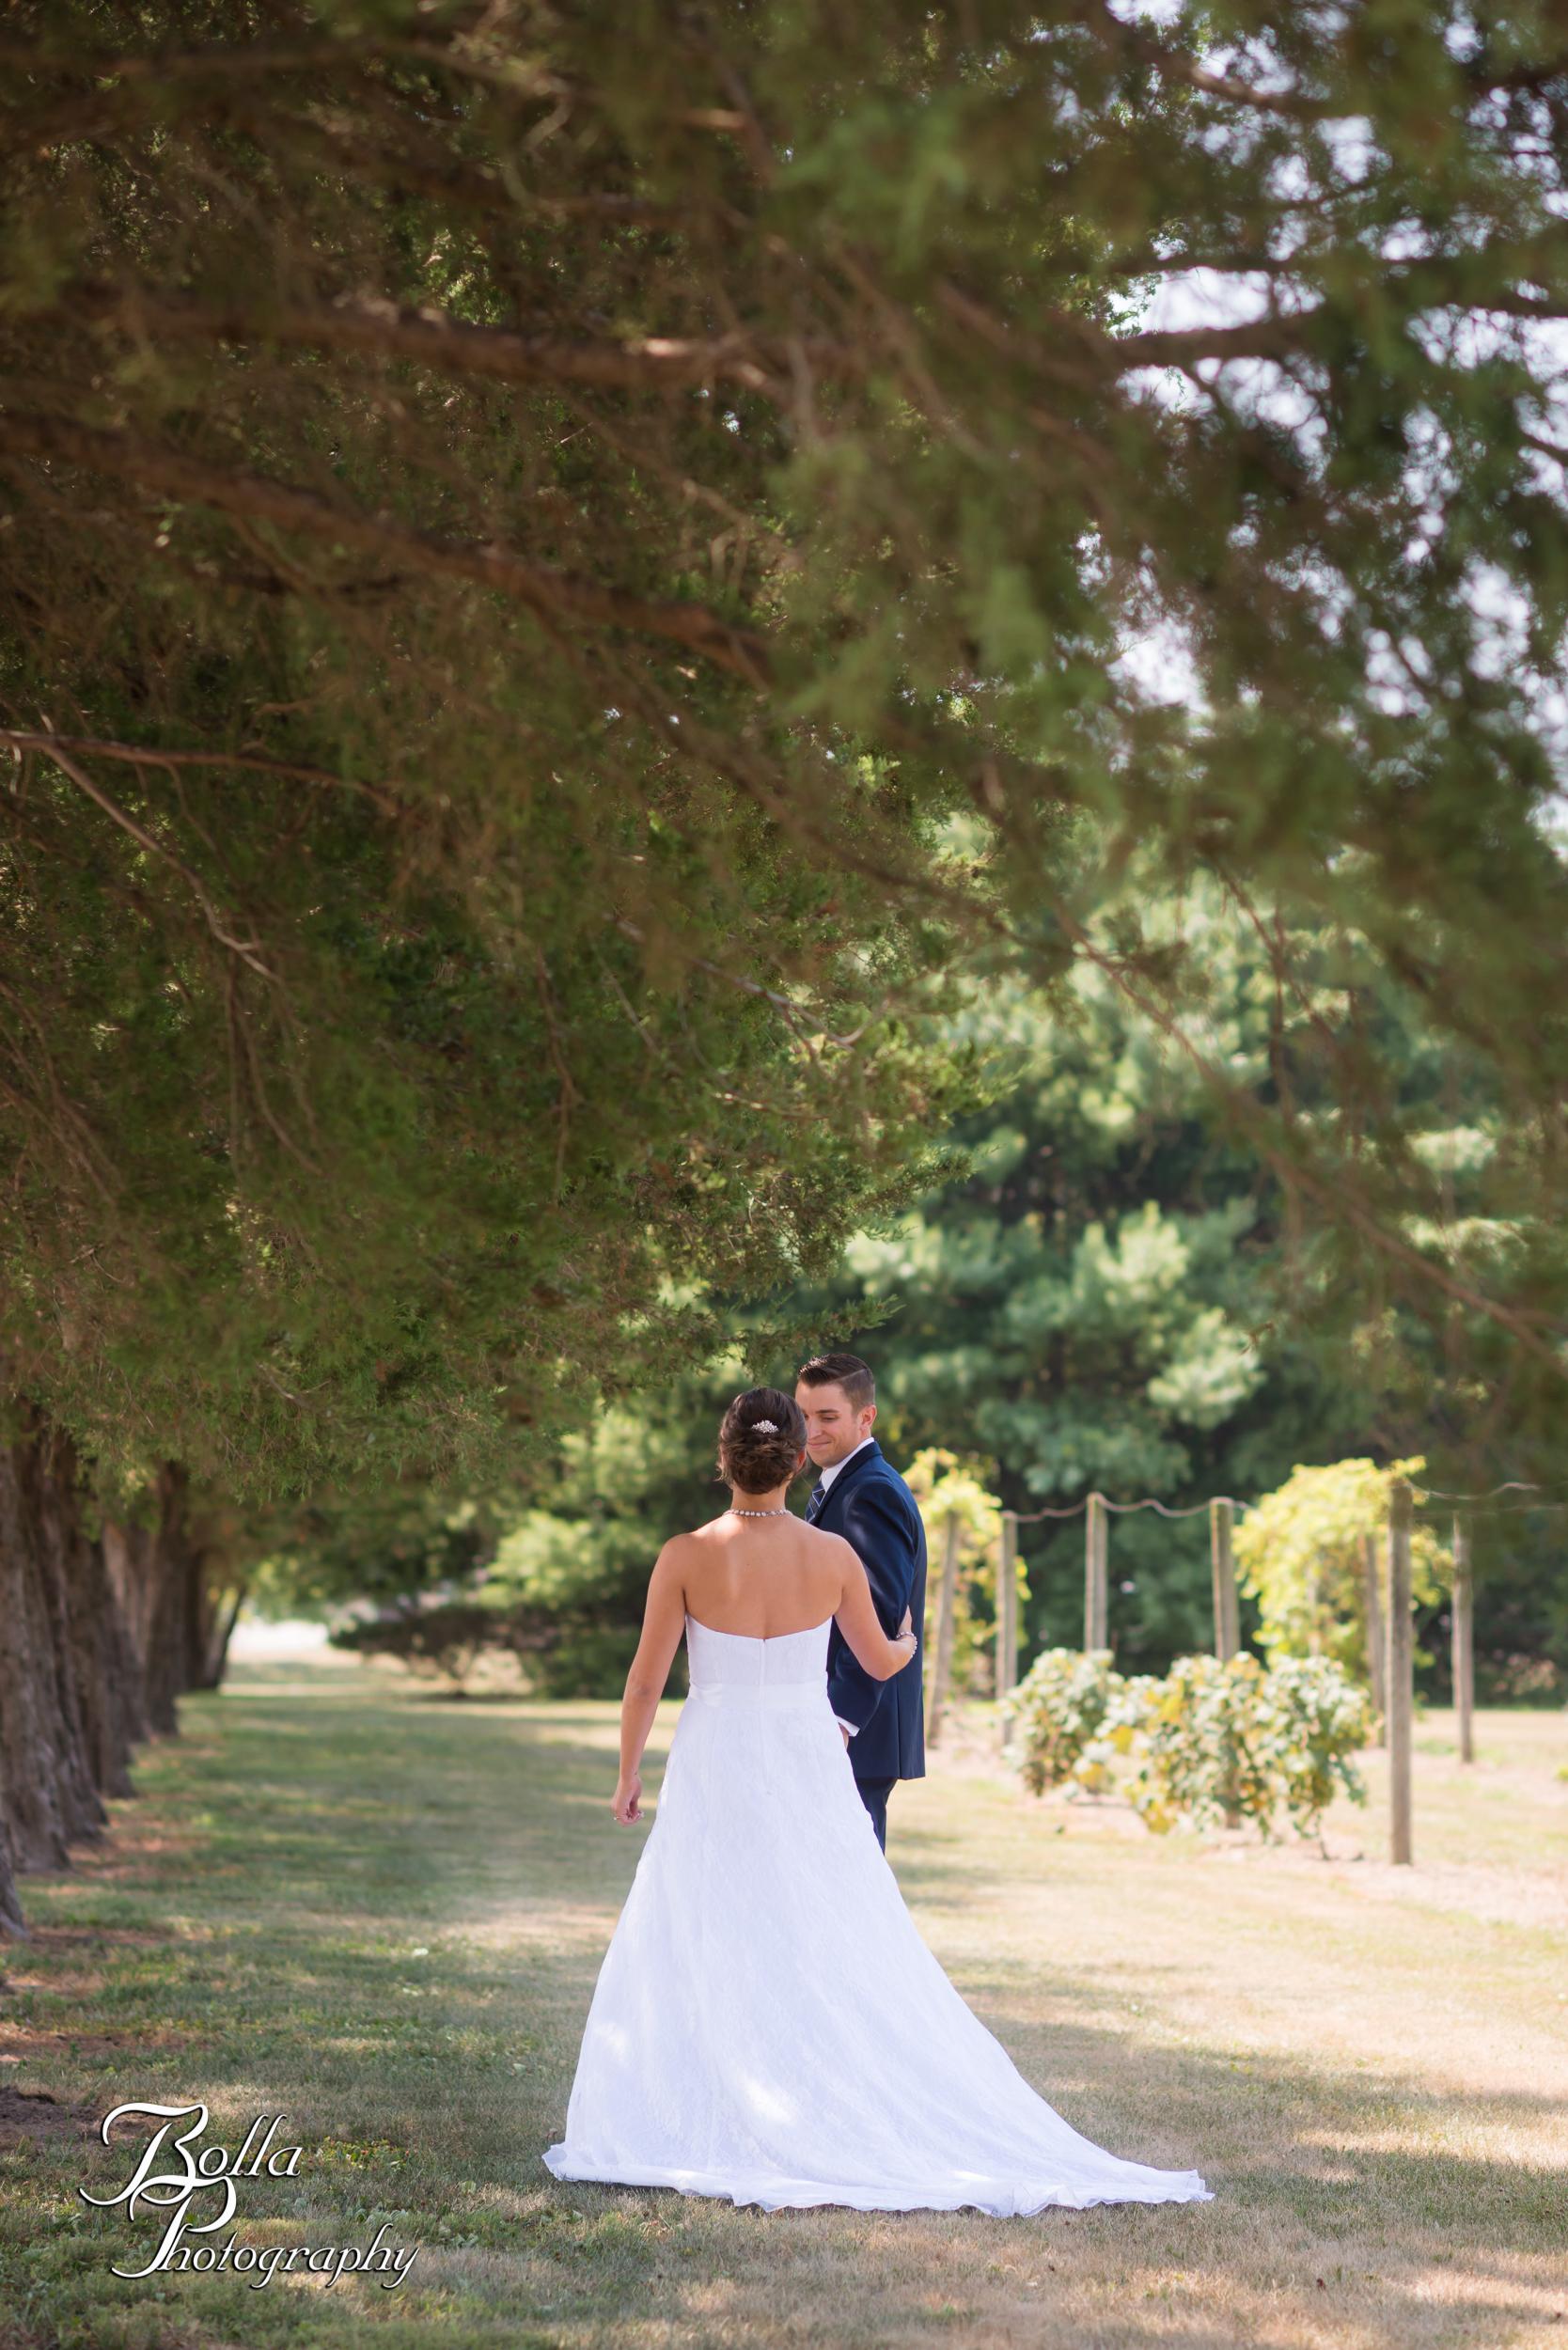 Bolla_photography_edwardsville_wedding_photographer_st_louis_weddings_Jessica_Barbachem_Dillon_Kaesberg_Waterloo_Red_Bud-0084.jpg